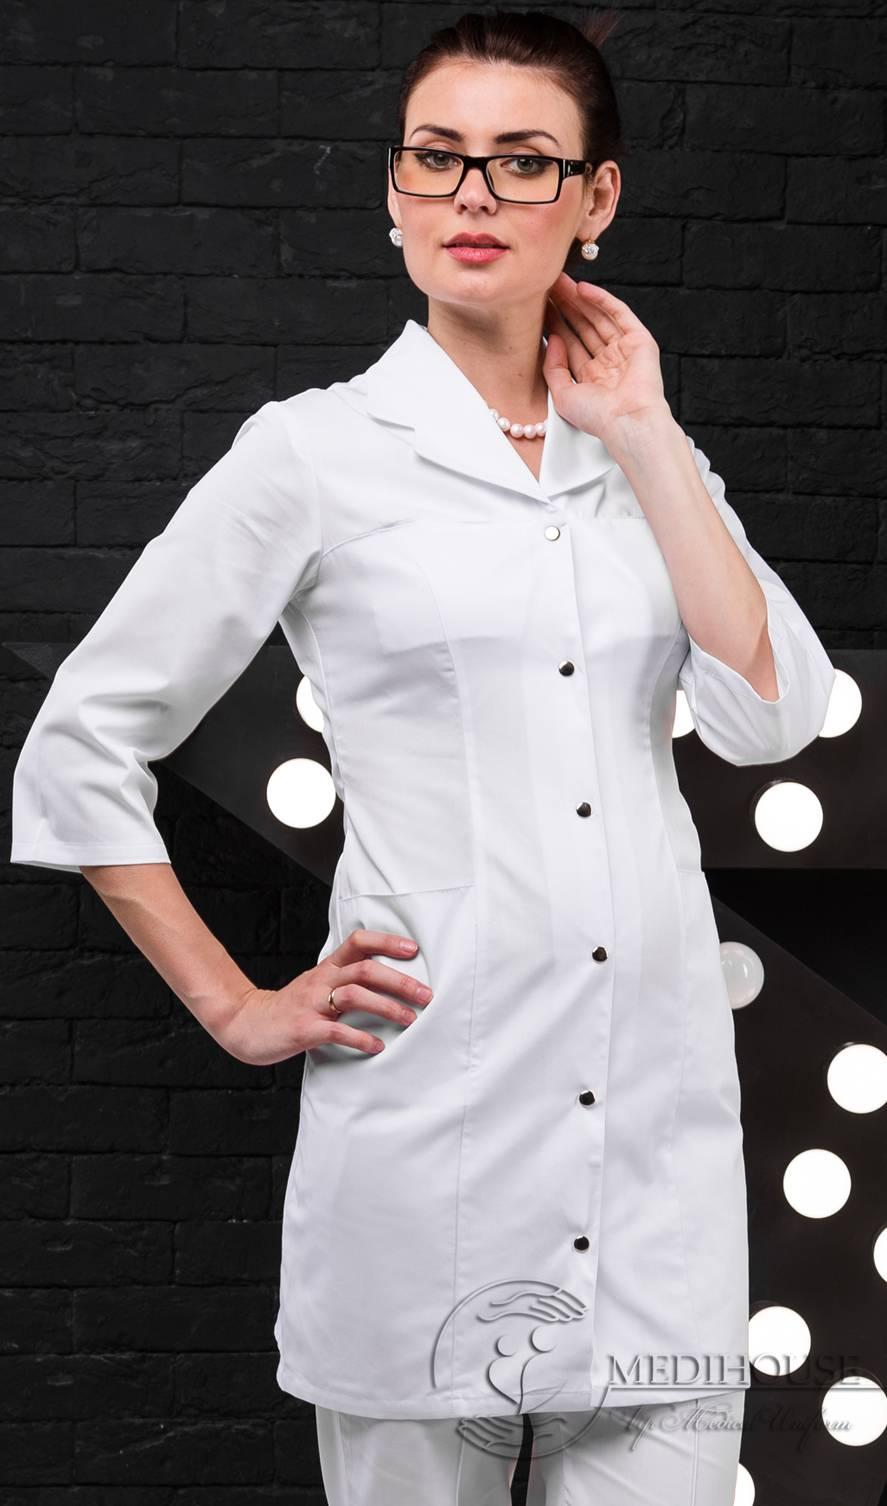 Женский медицинский халат мод. 1.0.8 White